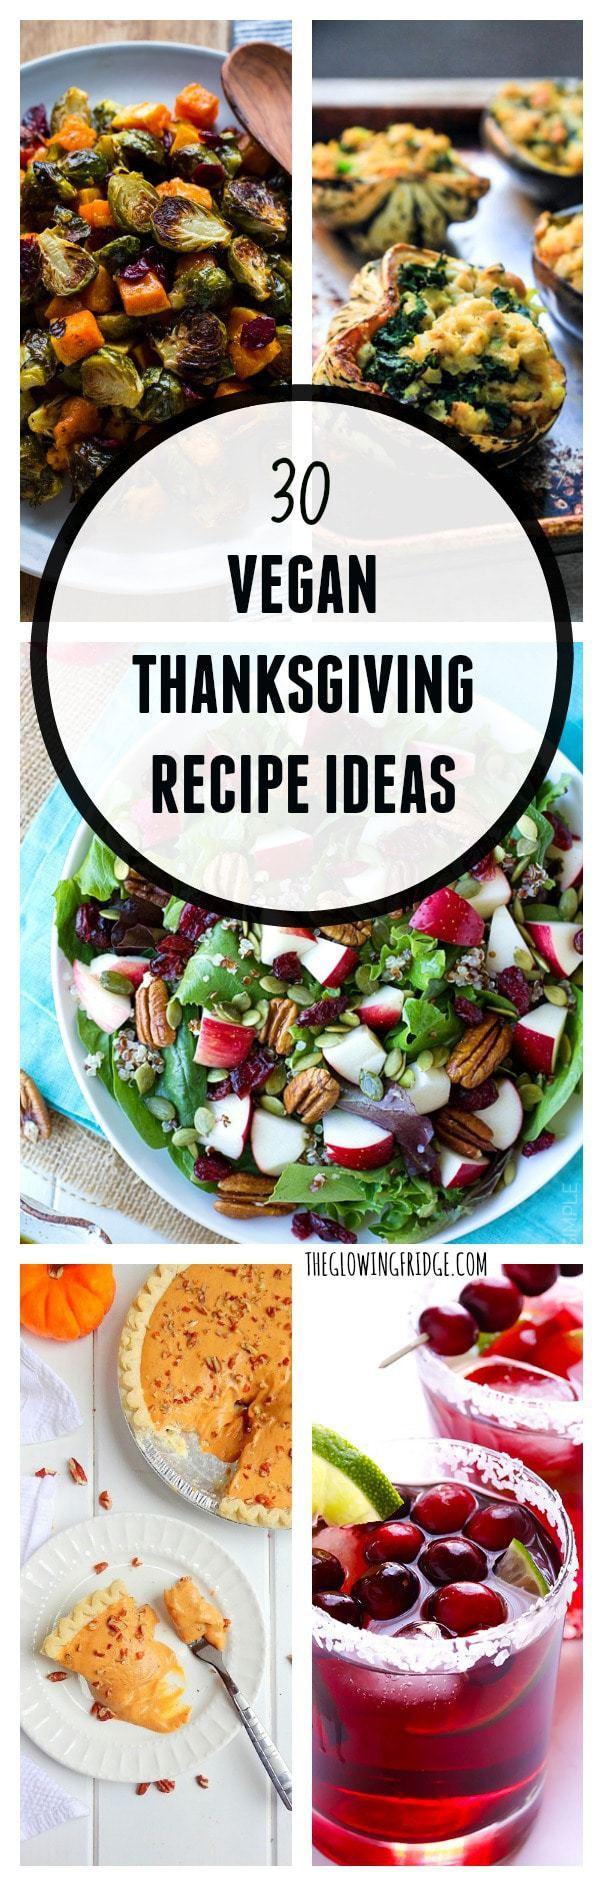 Vegetarian Thanksgiving Ideas  30 Vegan Thanksgiving Recipe Ideas The Glowing Fridge